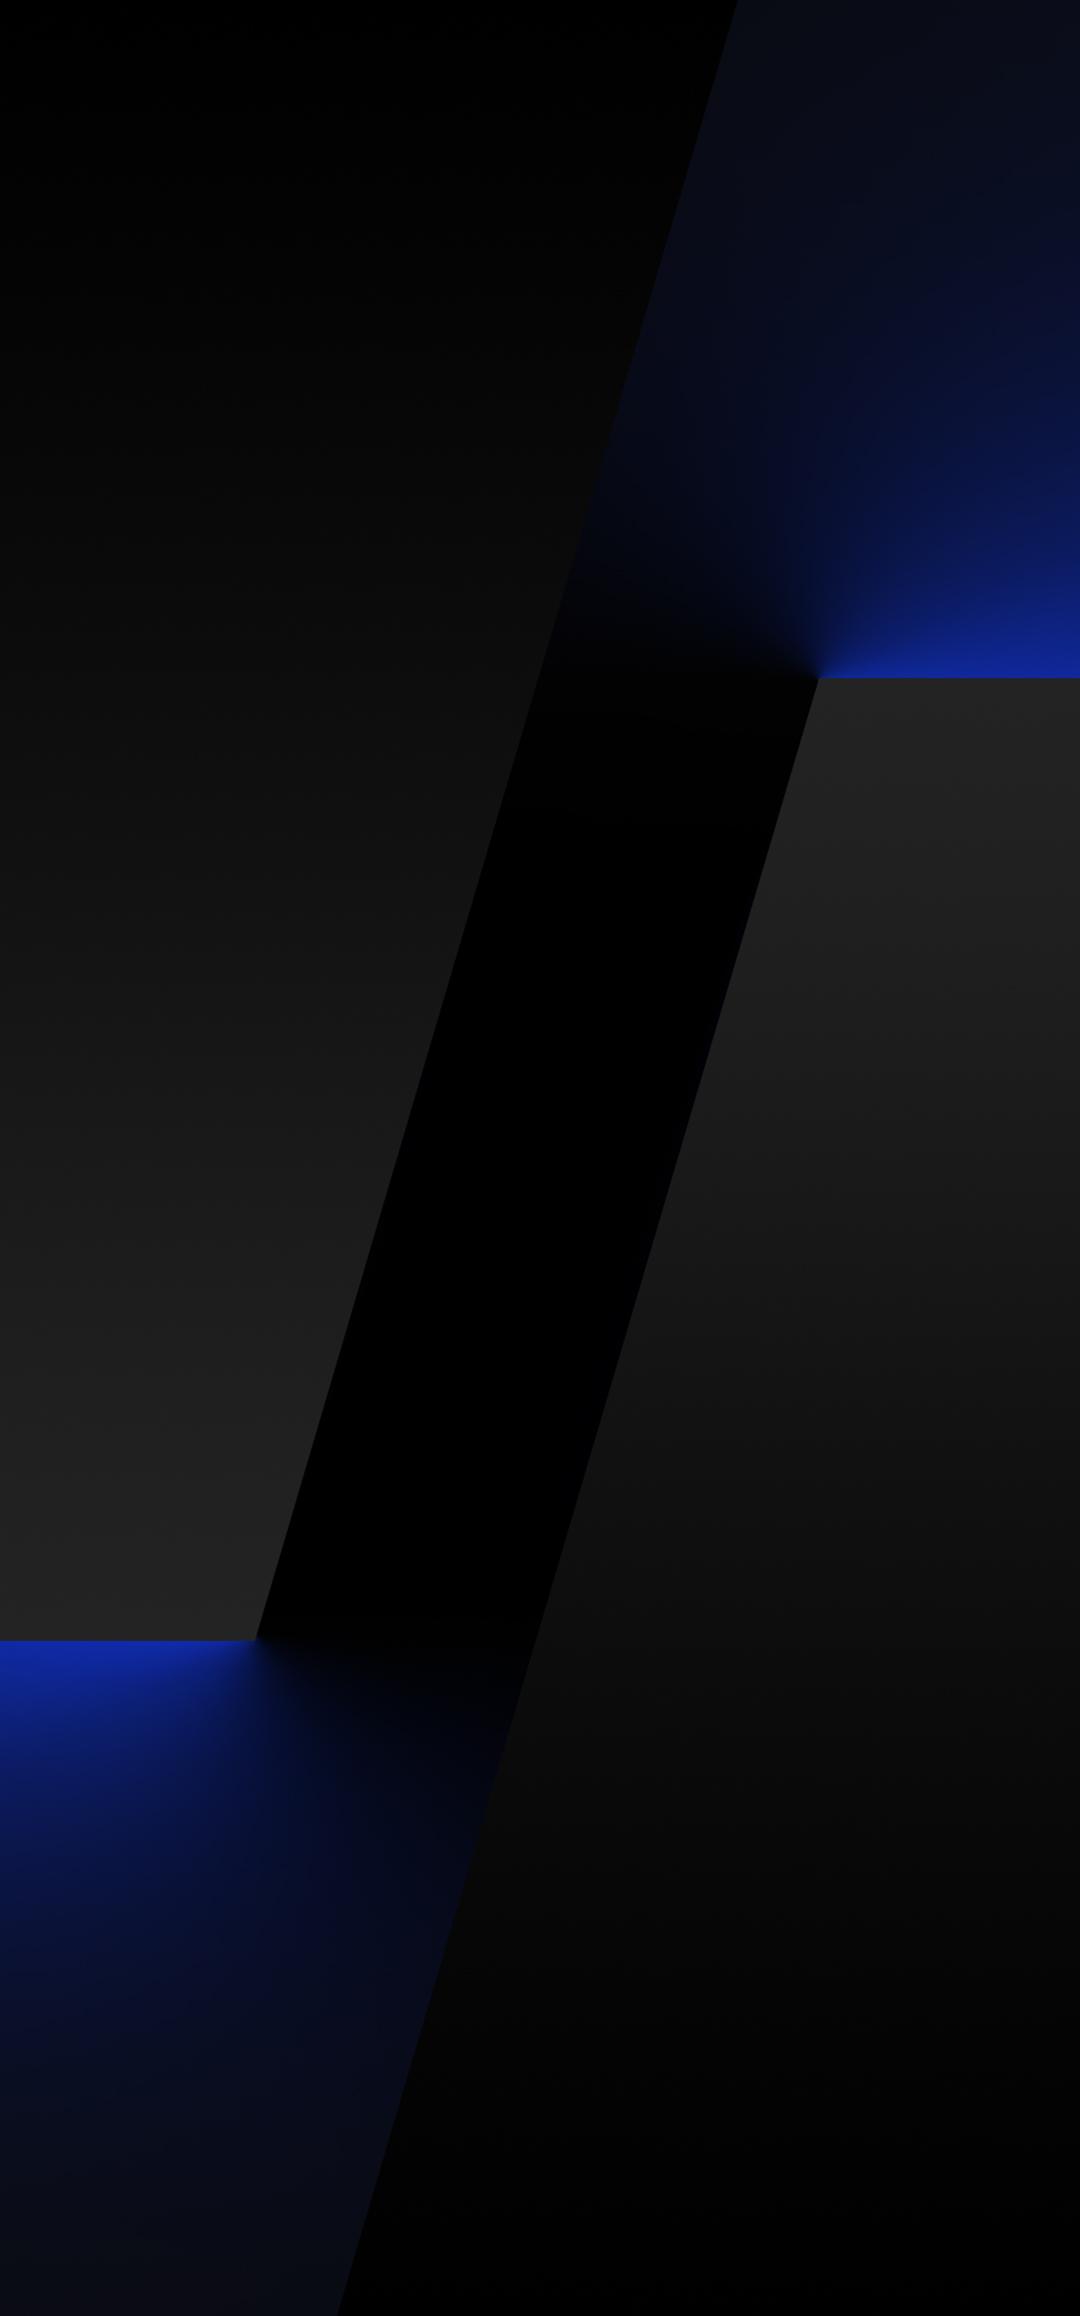 Vivo Black Wallpaper Full Hd 1080x2316 Download Hd Wallpaper Wallpapertip